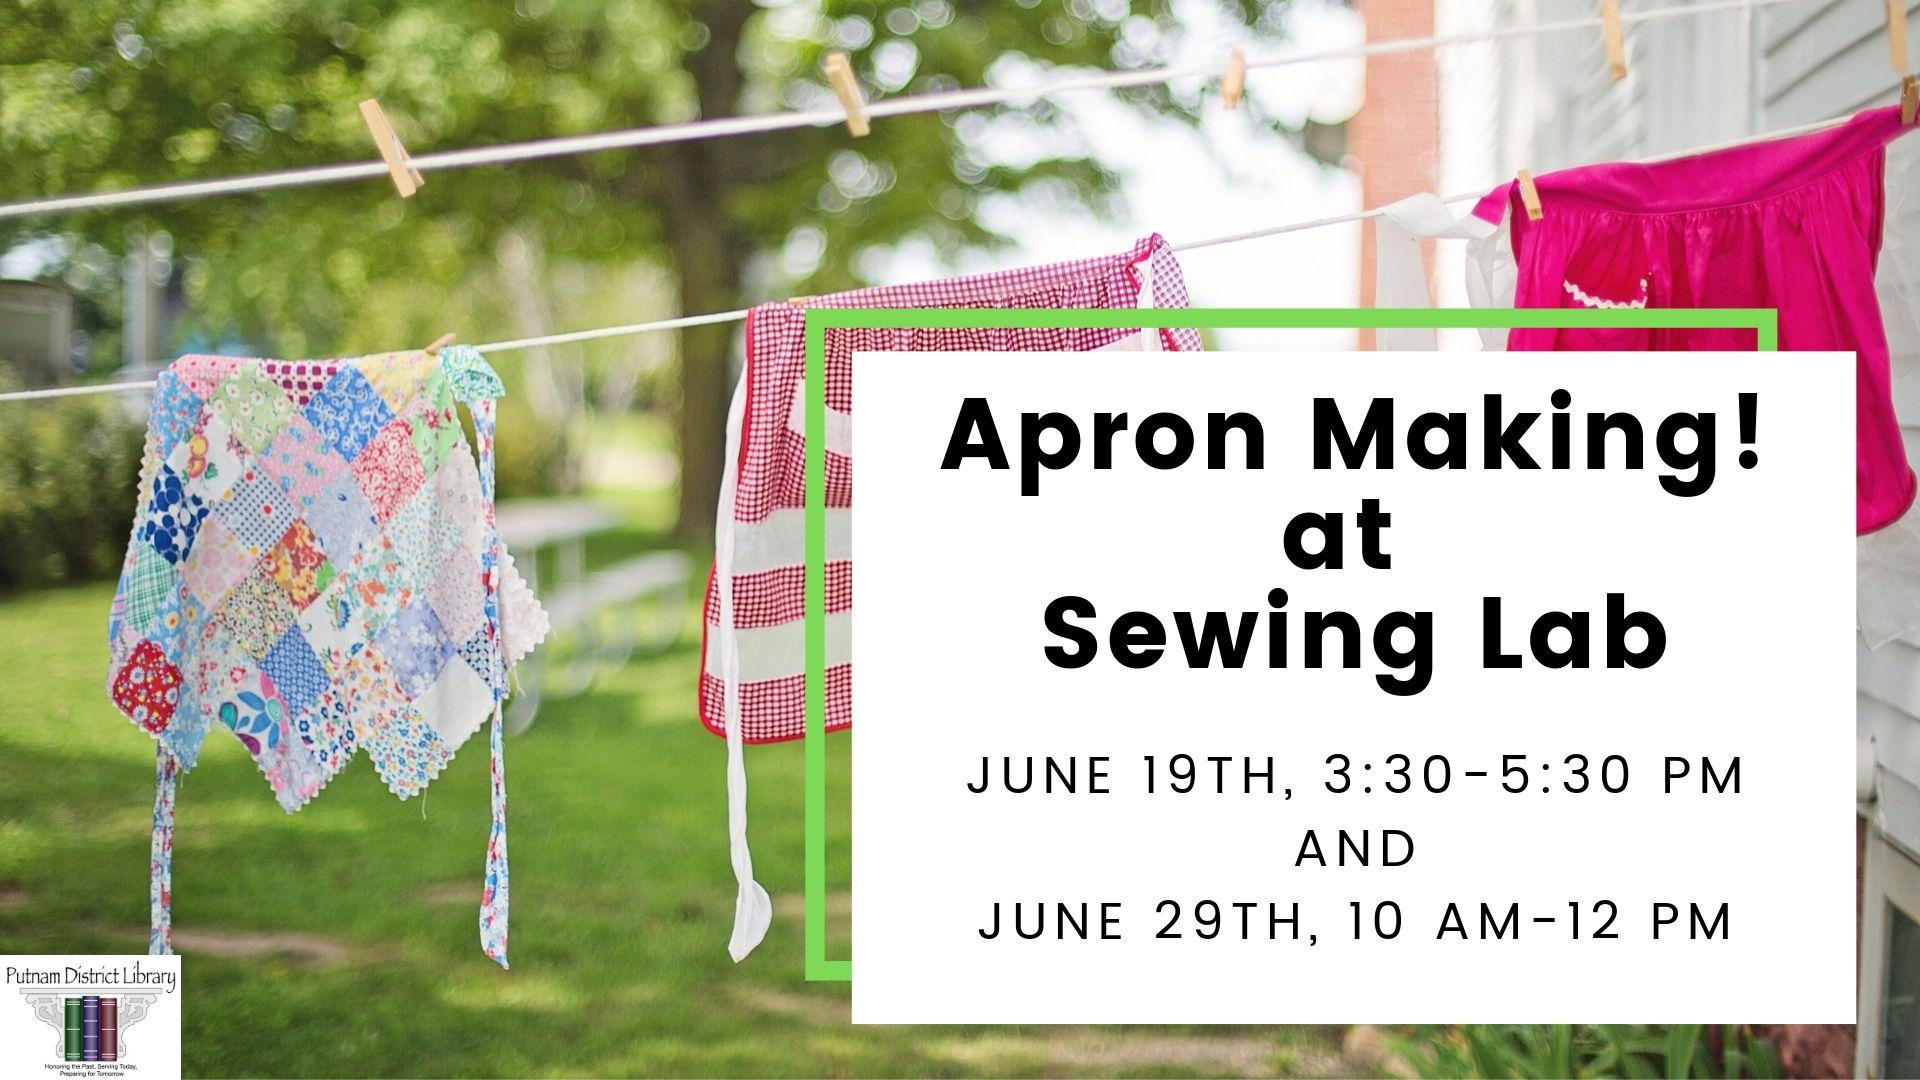 Apron Making at Sewing Lab